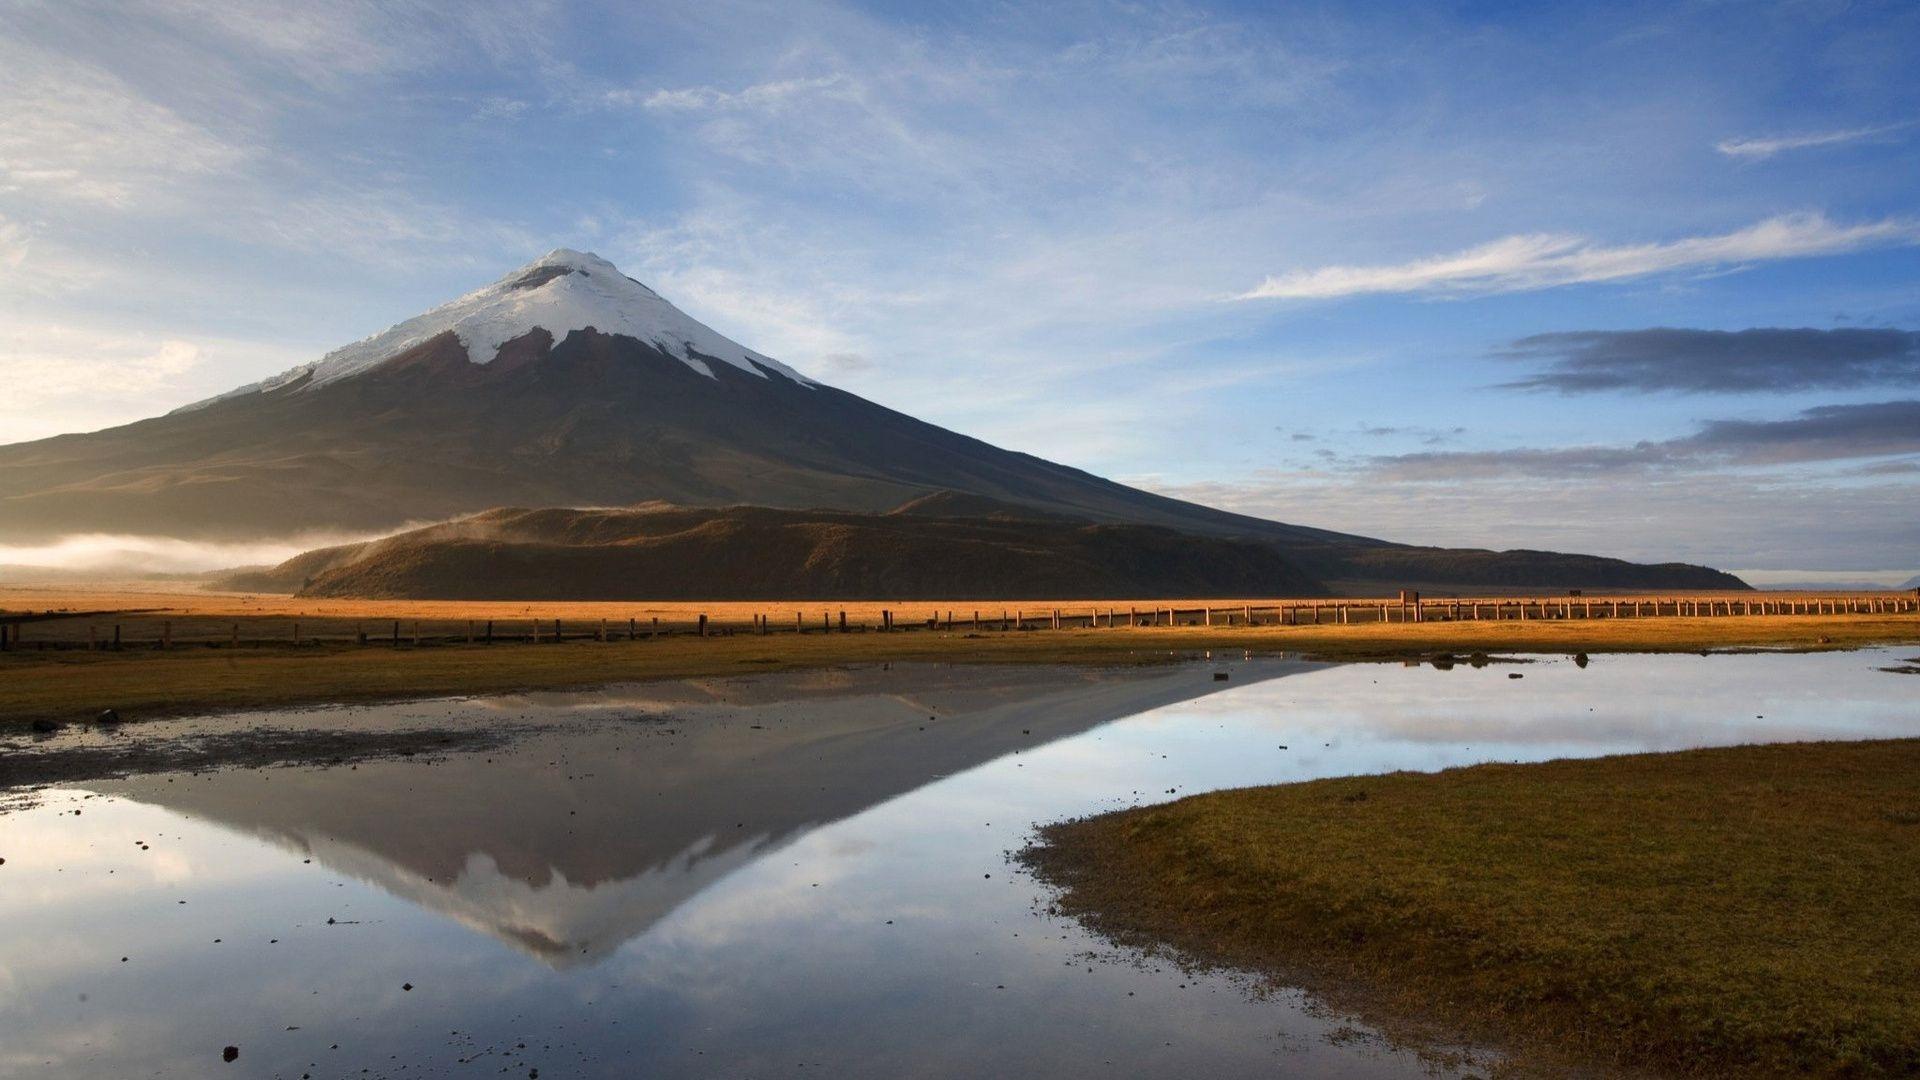 Ecuador Nature wallpaper for desktop